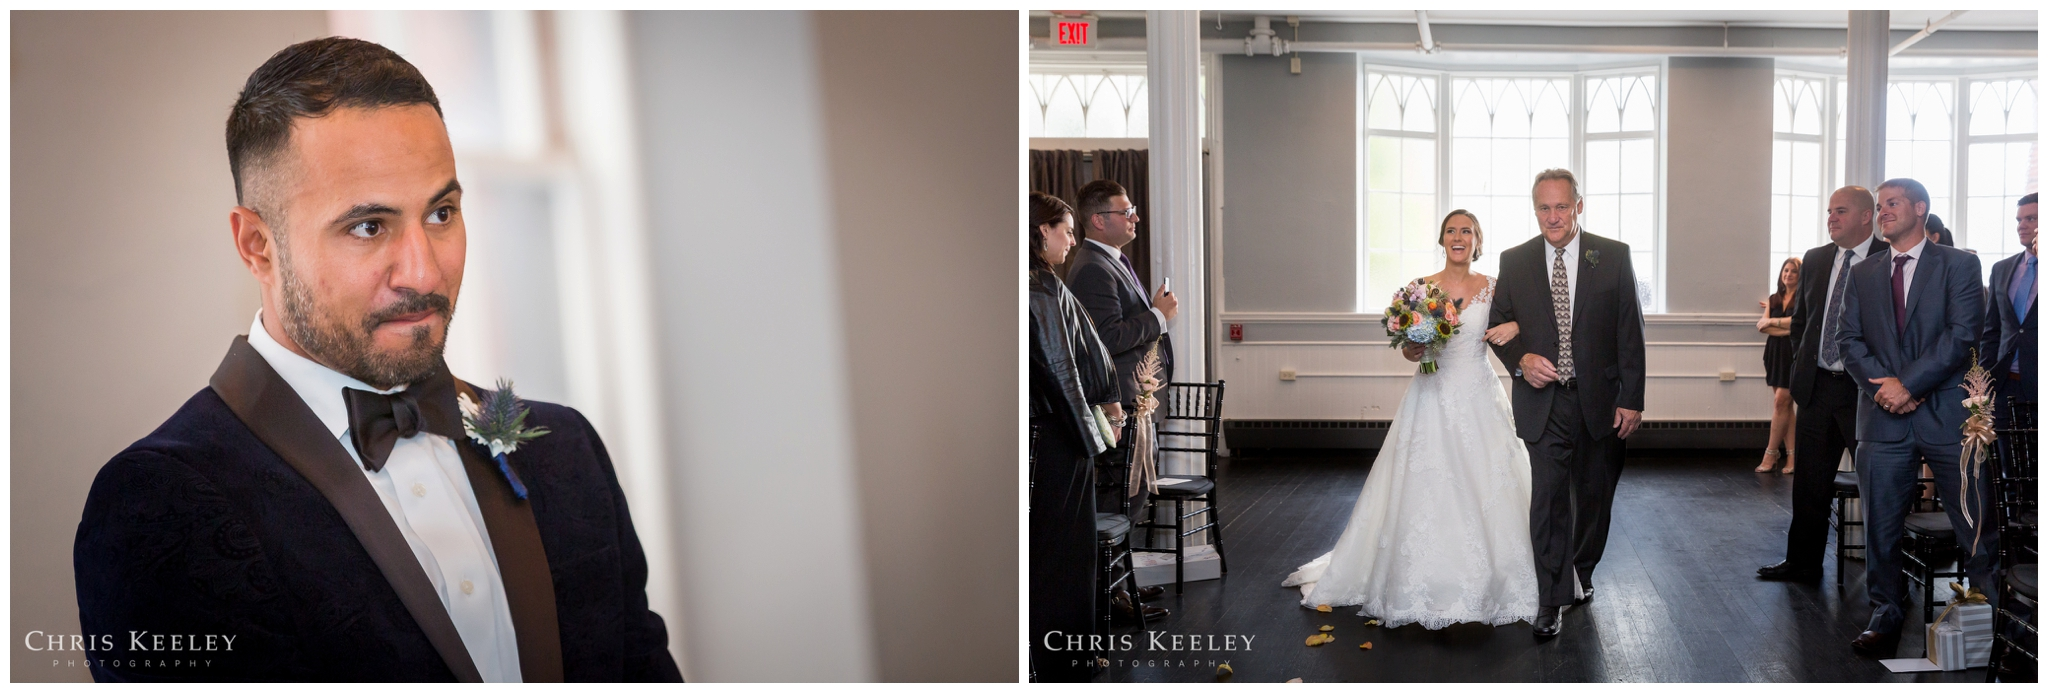 grace-restaurant-portland-maine-wedding-photographer-chris-keeley-35.jpg